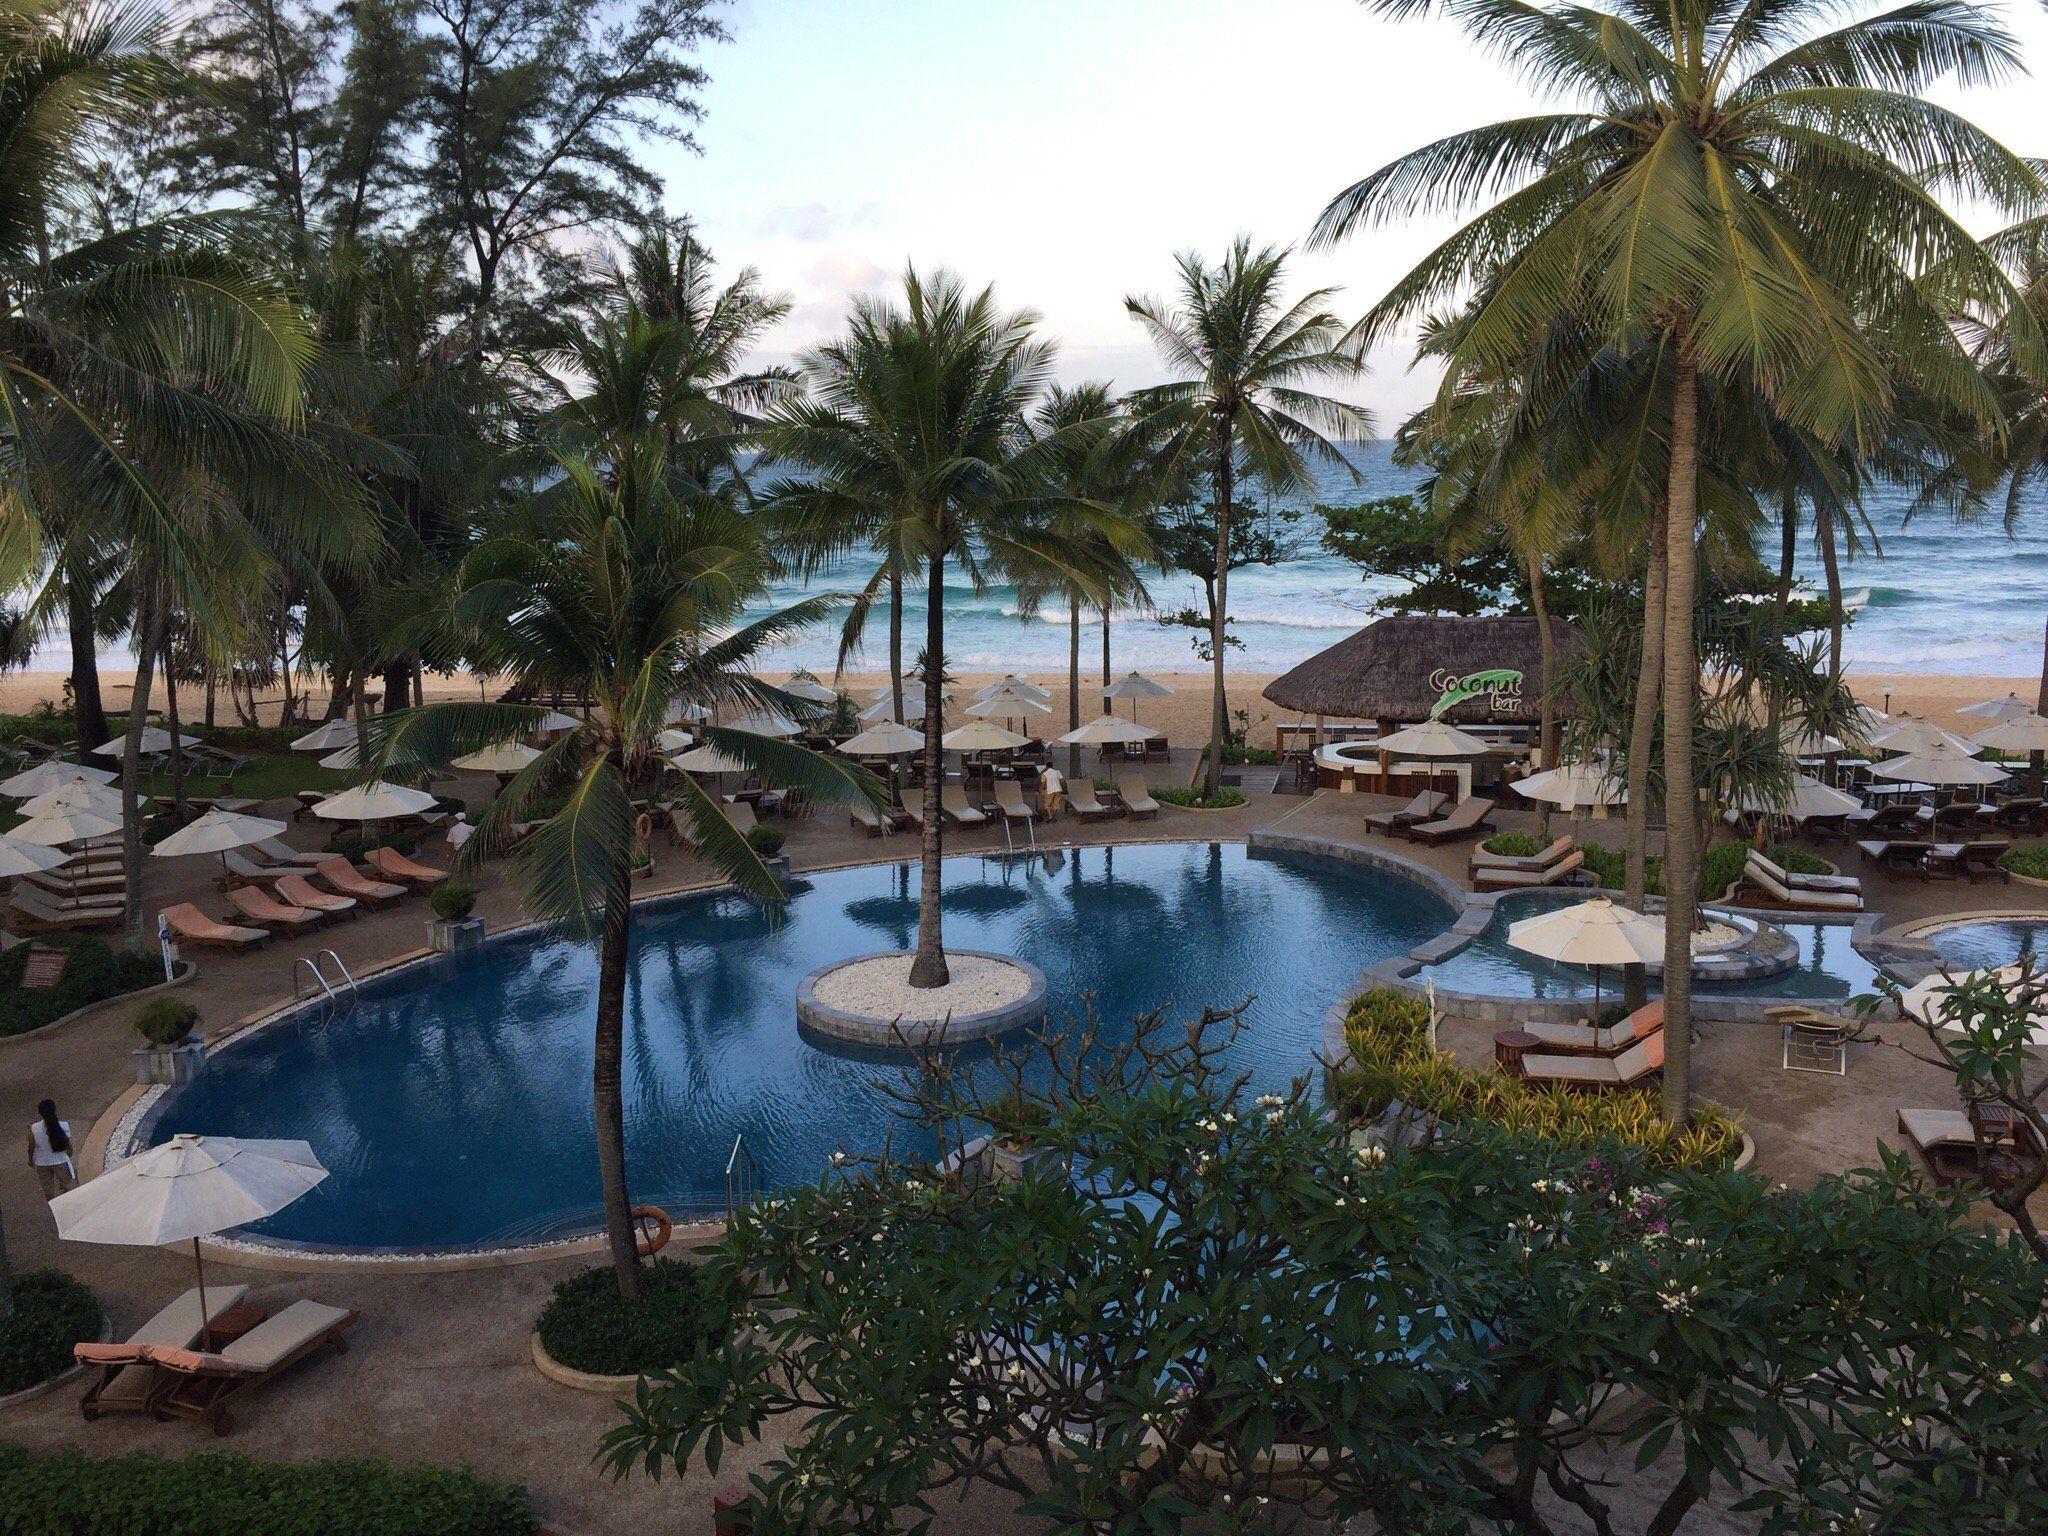 Katathani Phuket Beach Resort ($̶3̶3̶1̶) $215 - UPDATED 2017